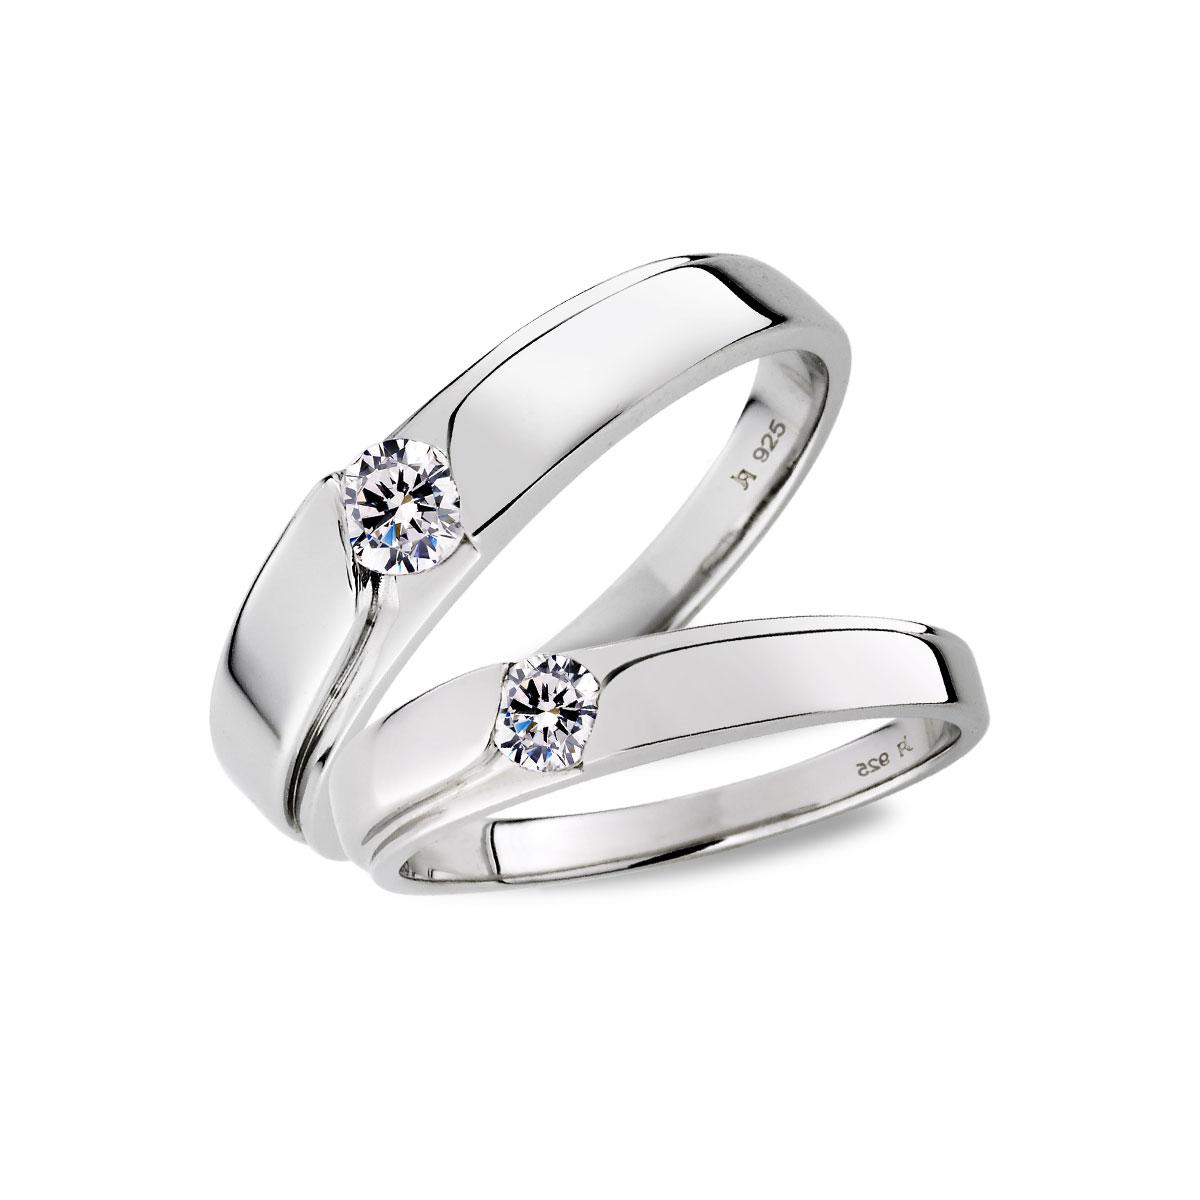 KSH12 因你而在單鑽情侶戒指